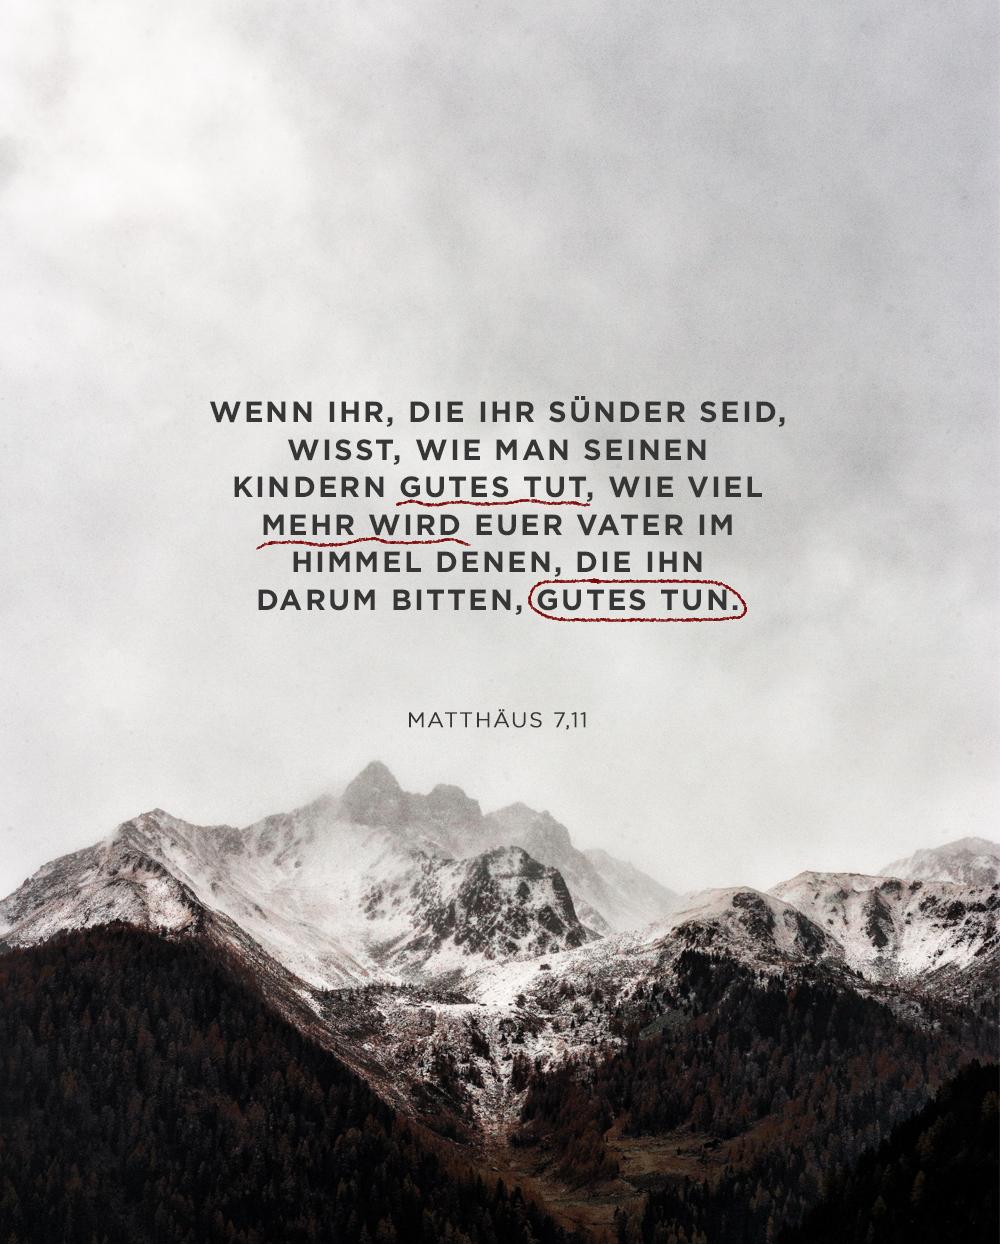 170518_Verse_Card_Matthewgerman Gottes Versprechen – Bibelverse zur Ermutigung | New Creation TV